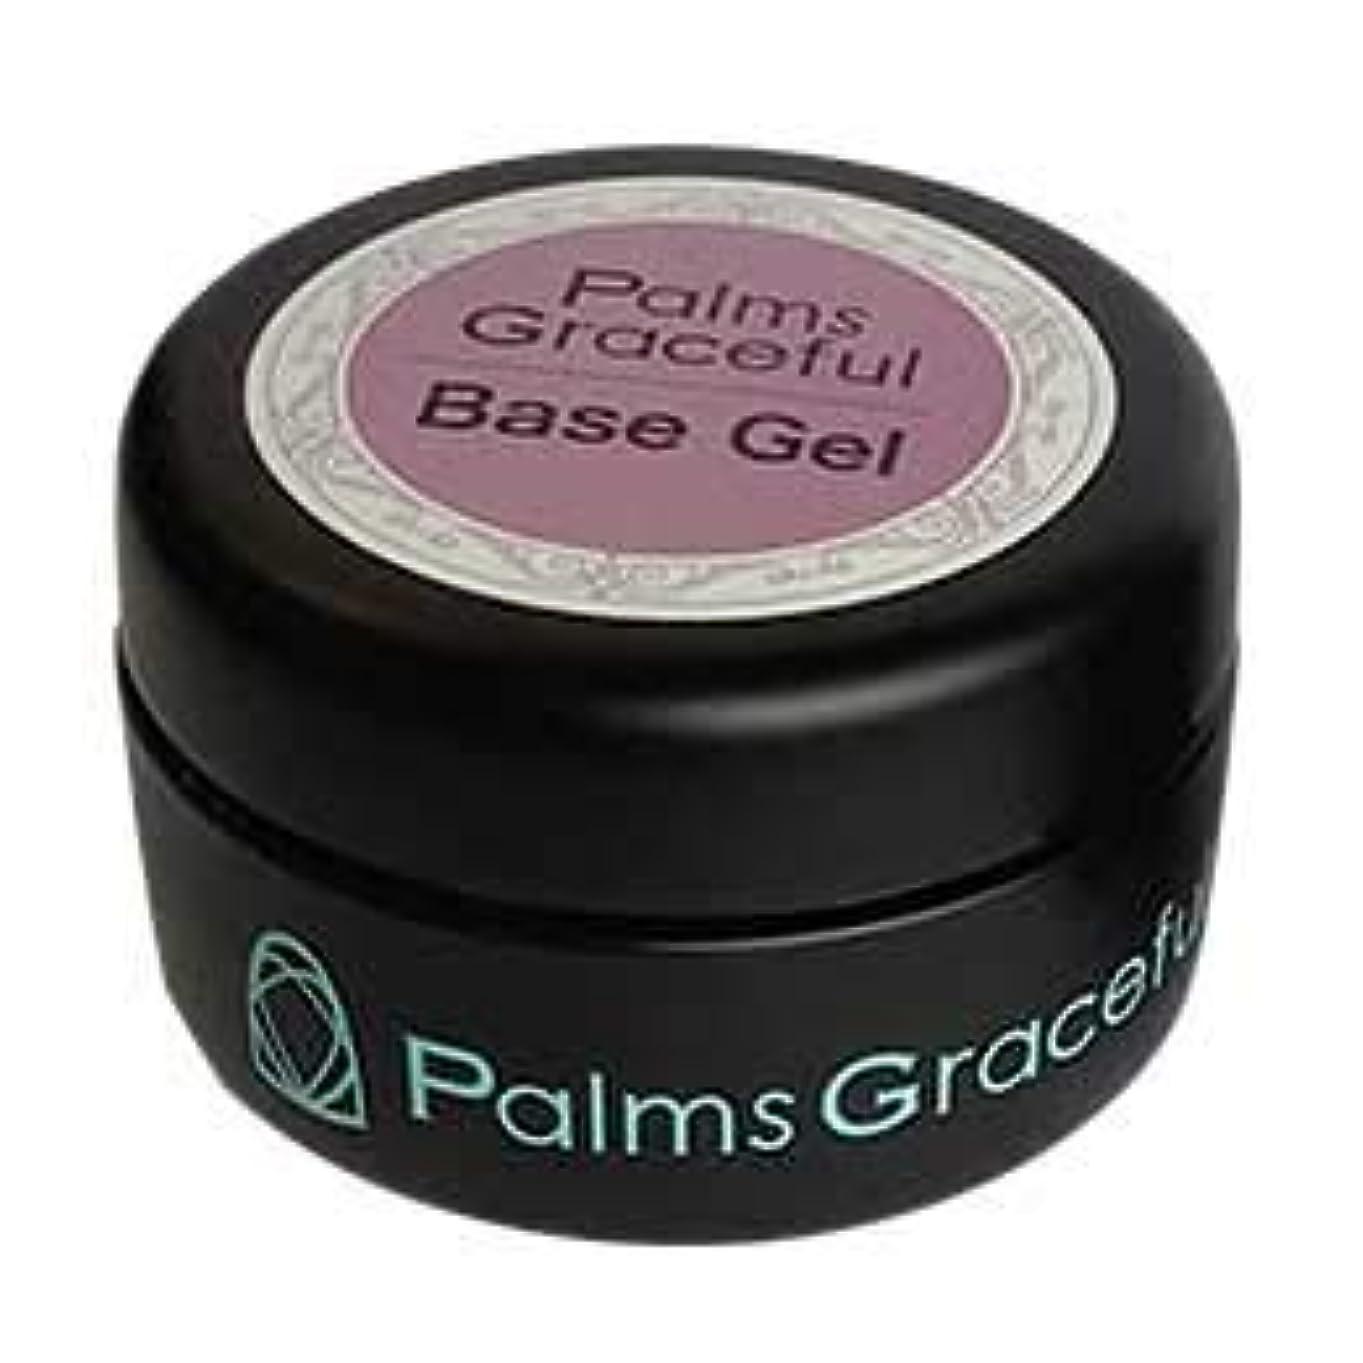 Palms Graceful ベースジェル 25g